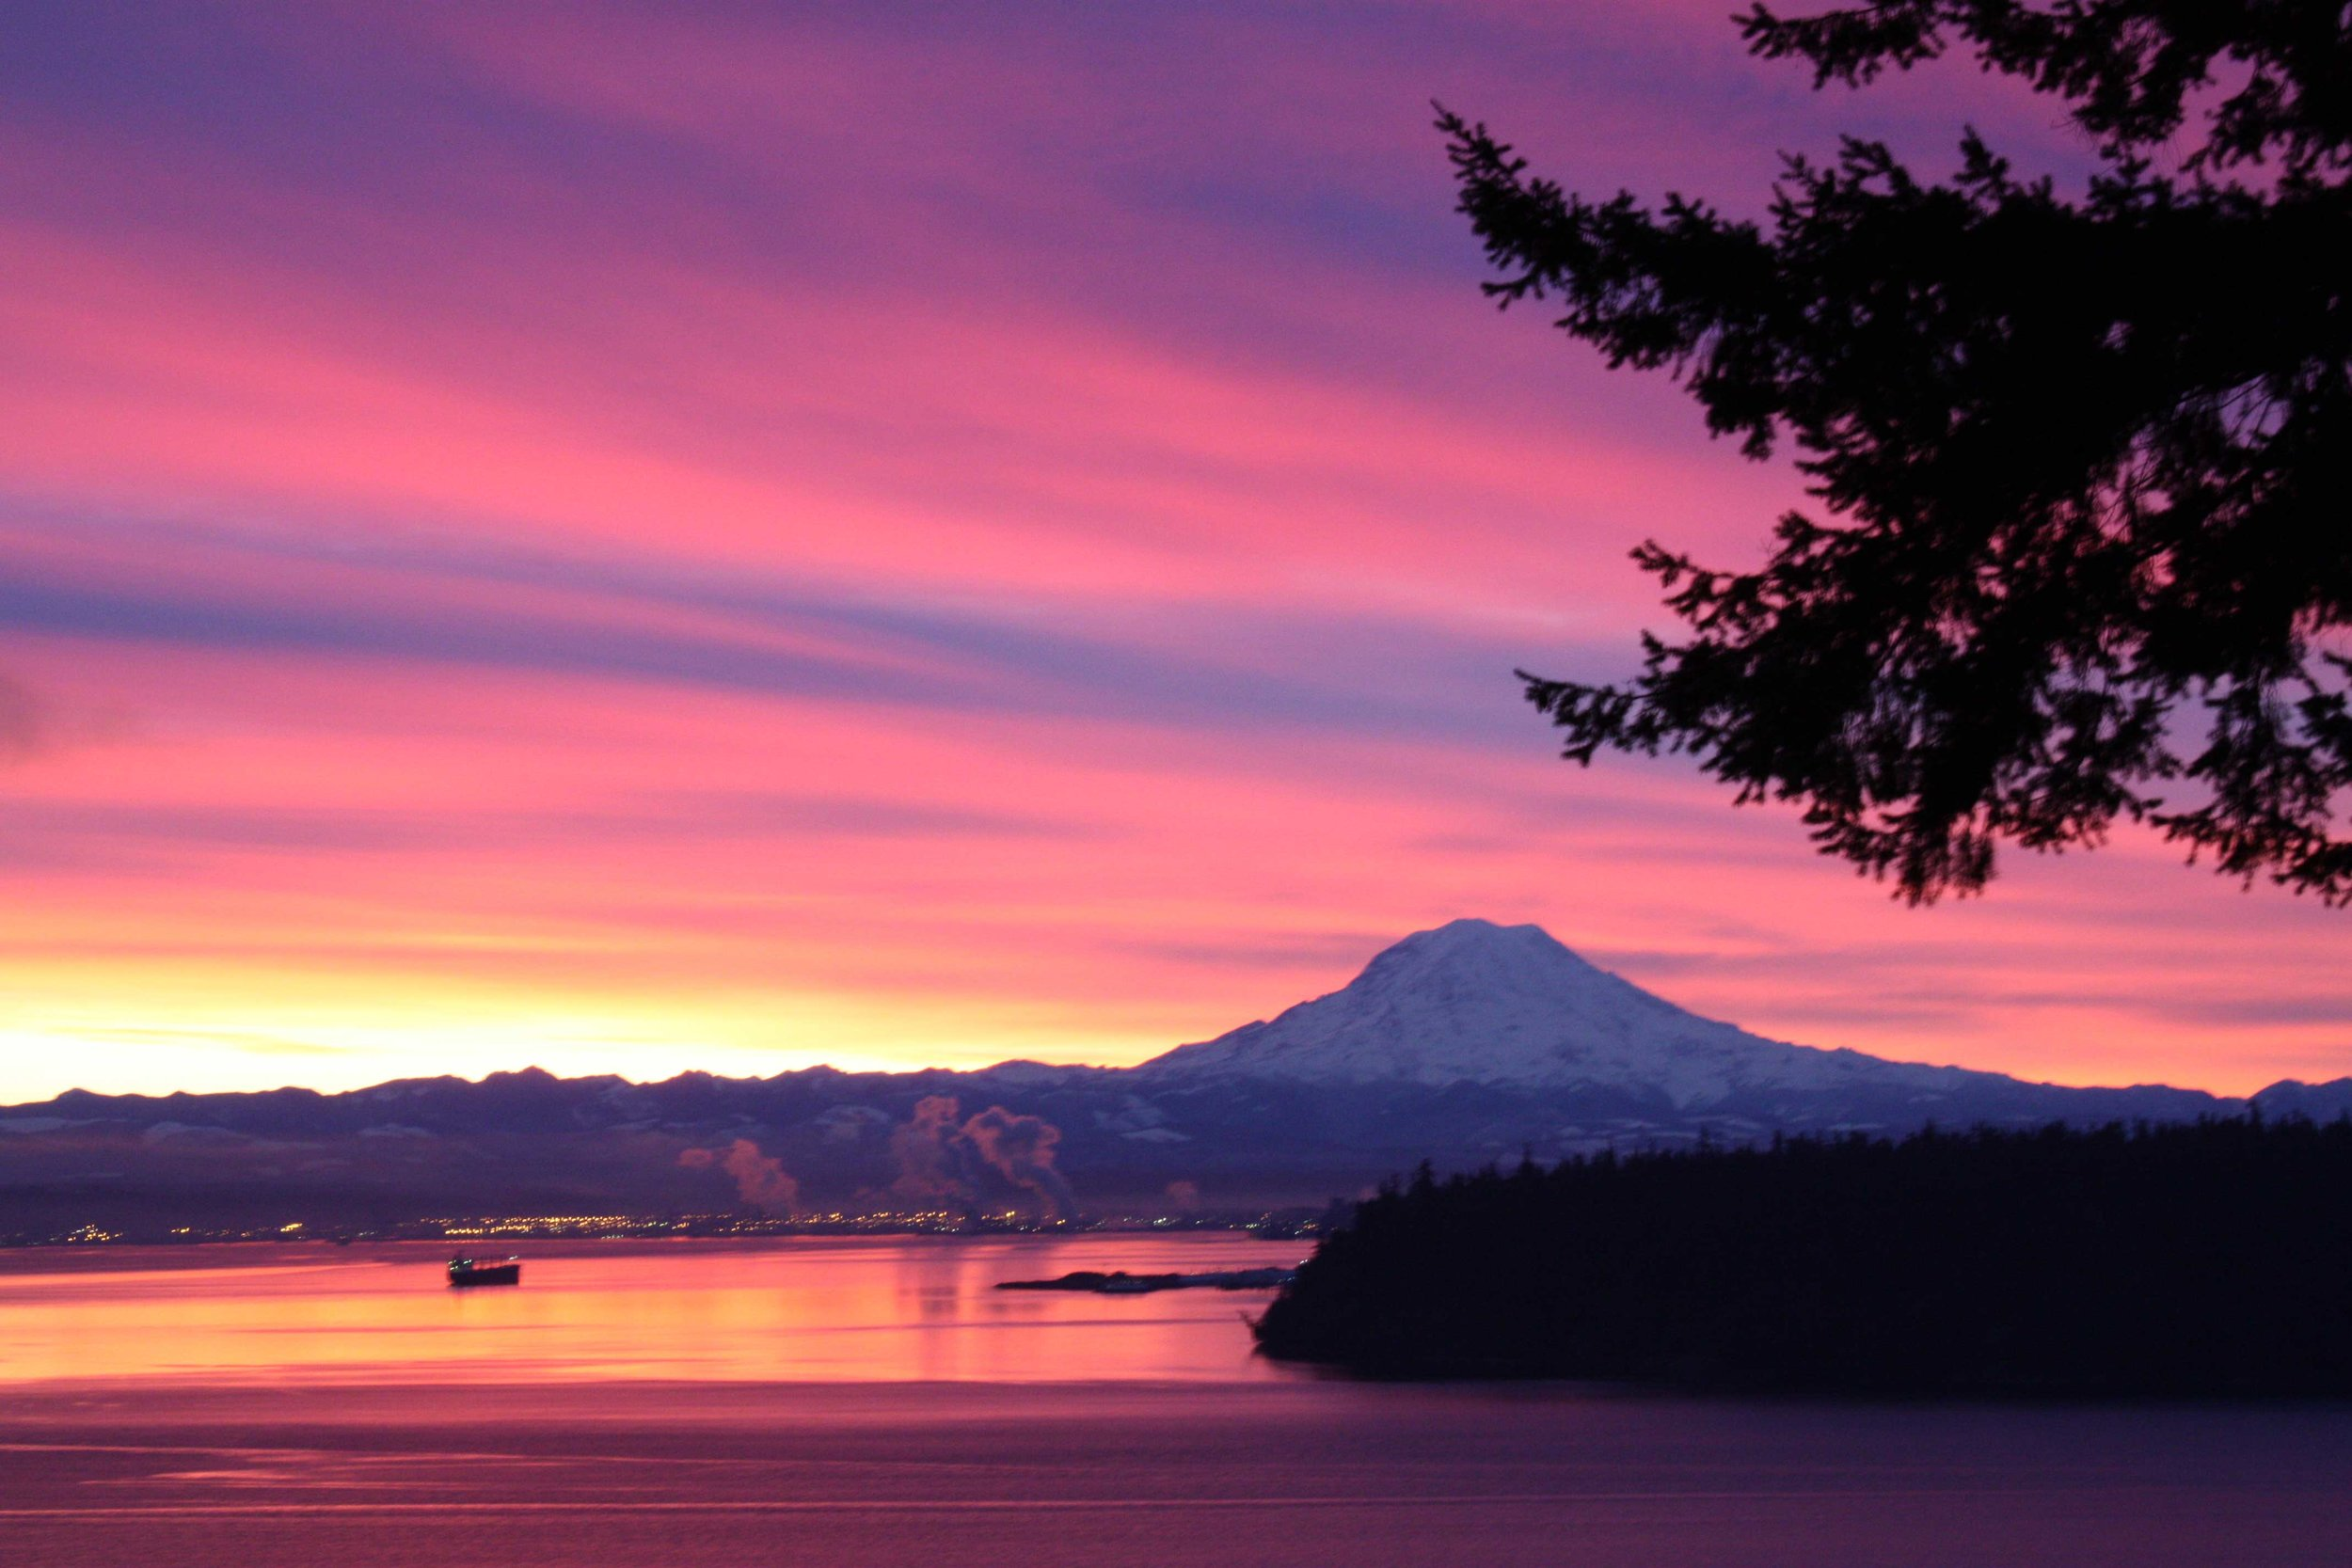 Mount-Raineer-in-Sunrise-pink-11.08_web.jpg